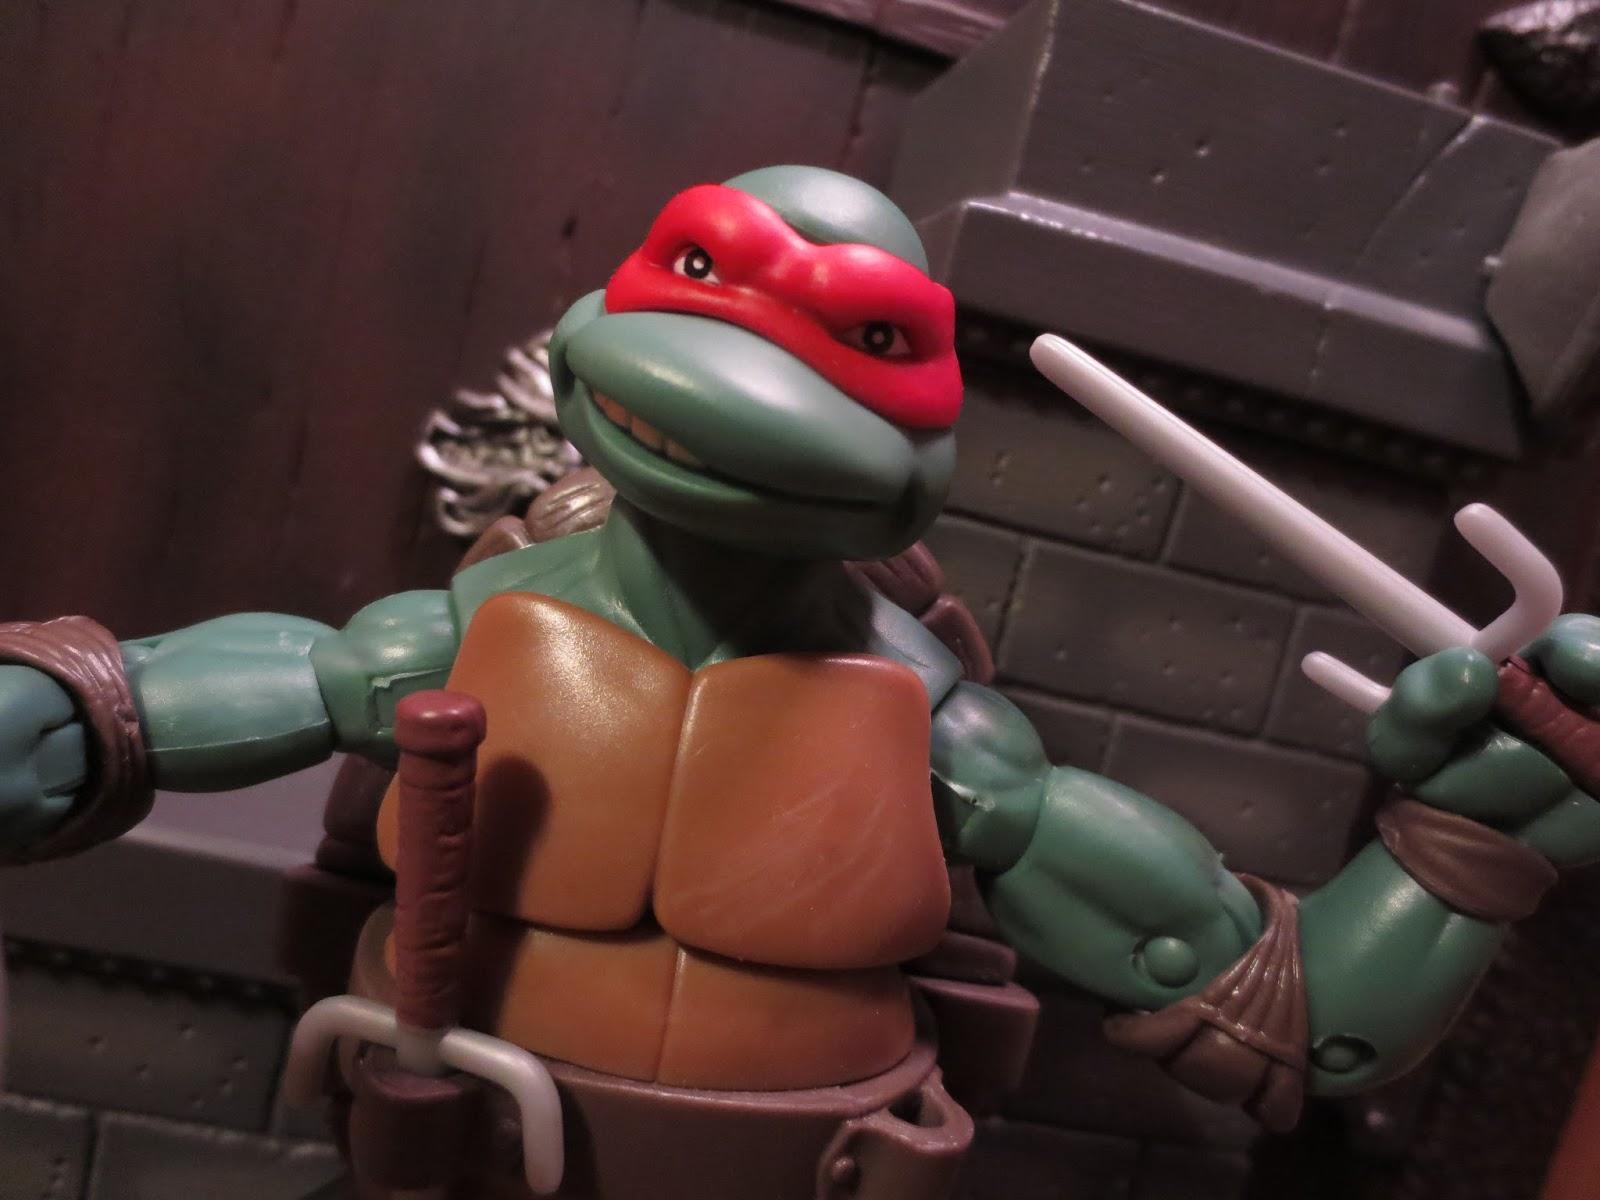 Retro review teenage mutant ninja turtles ii secret of the ooze - Action Figure Review Raphael From Teenage Mutant Ninja Turtles Classic Collection The Secret Of The Ooze By Playmates Toys